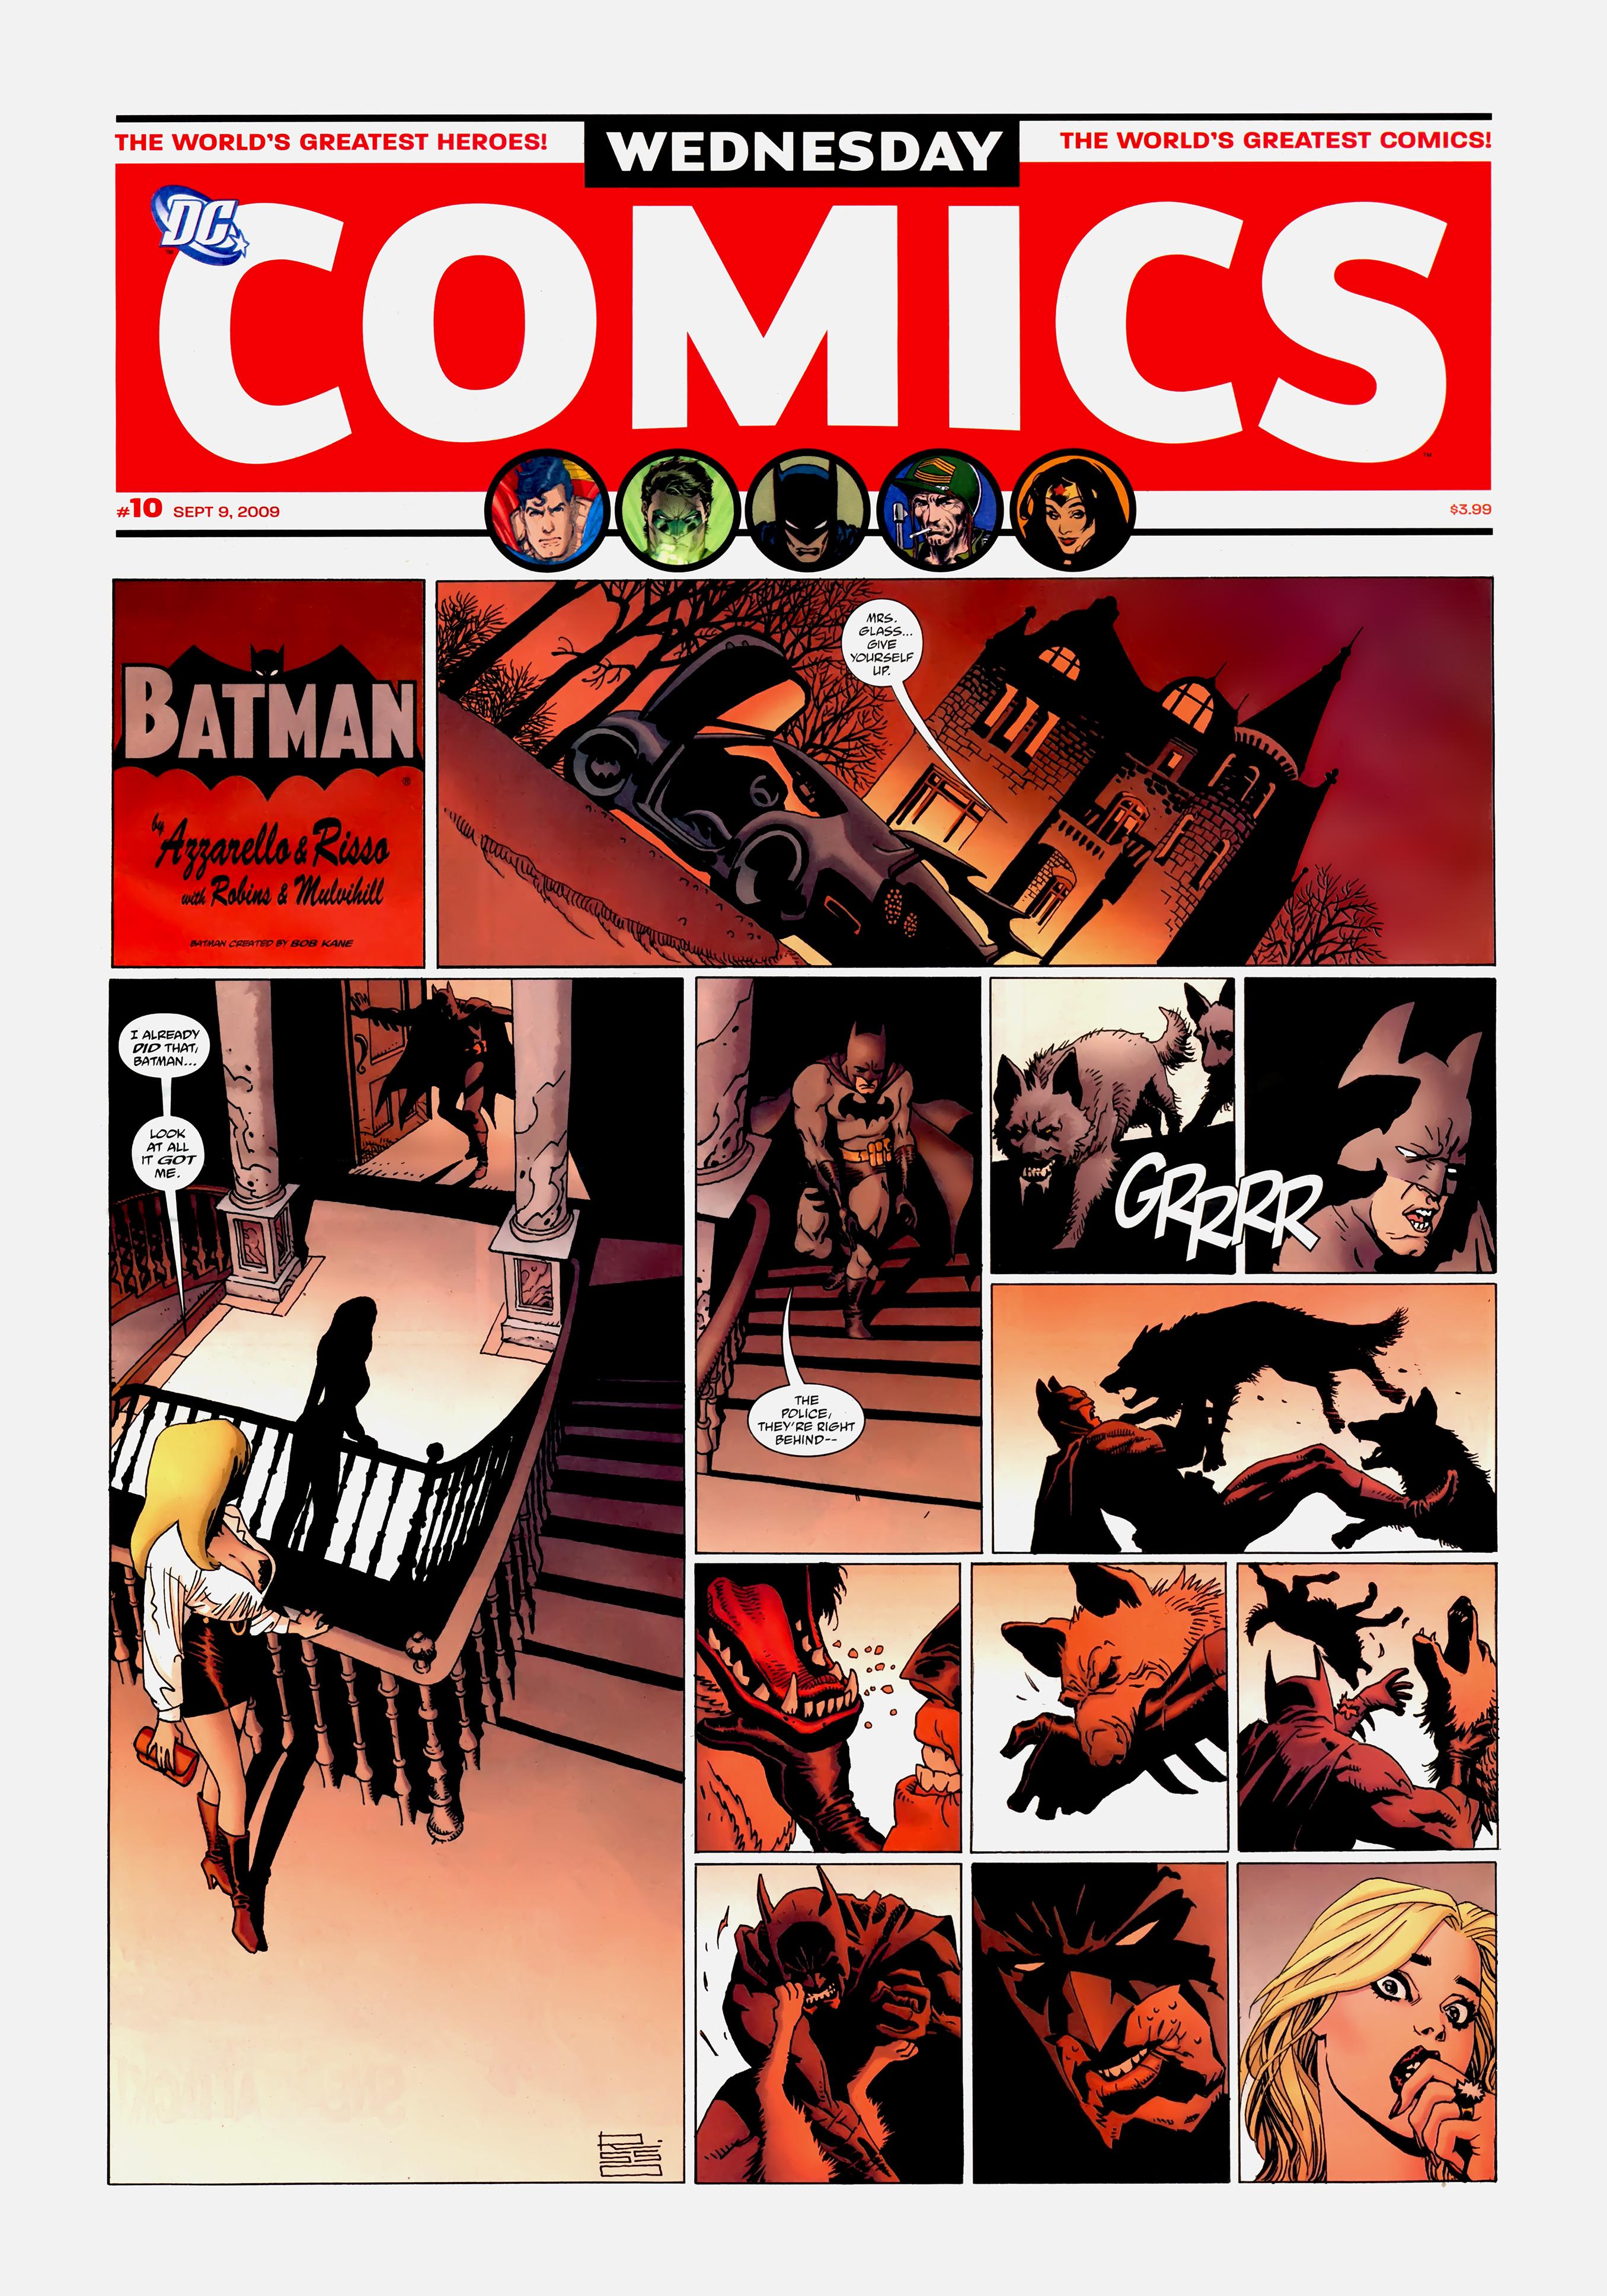 Read online Wednesday Comics comic -  Issue #10 - 2